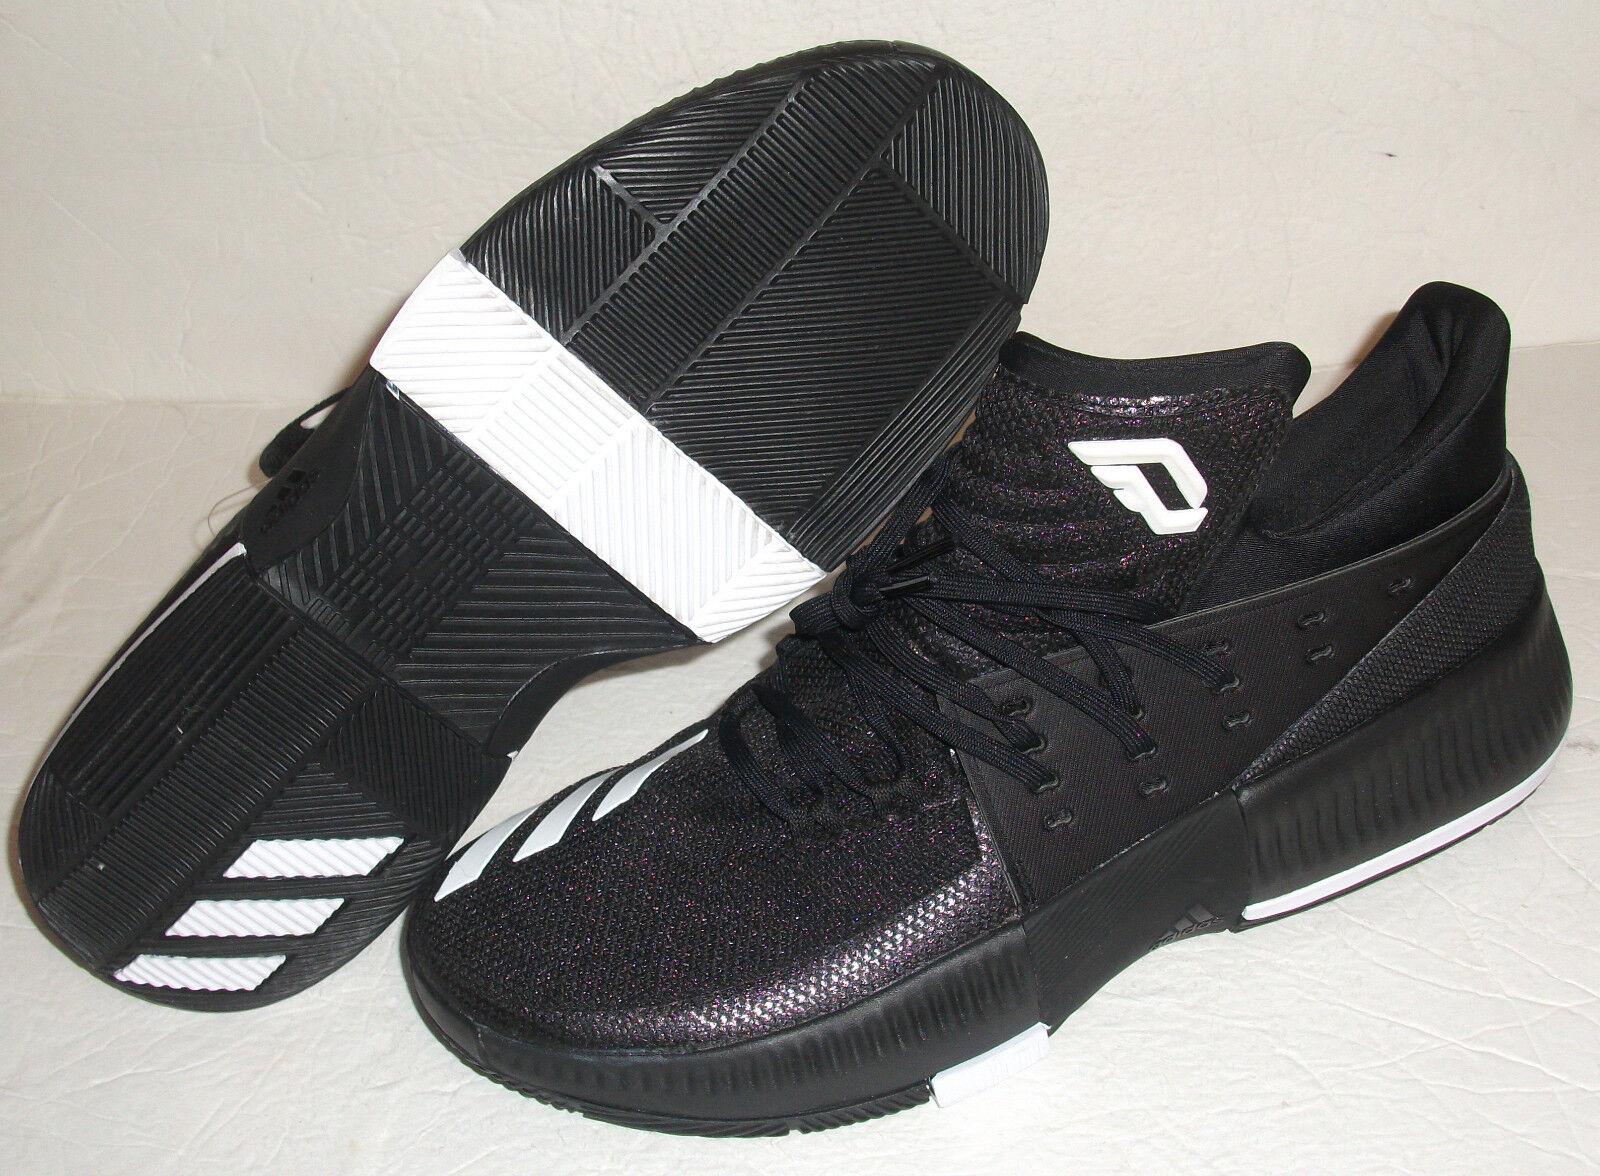 New Adidas Dame Lillard 3 PE, Mens Size 13, Black, StyCQ0277 Basketball